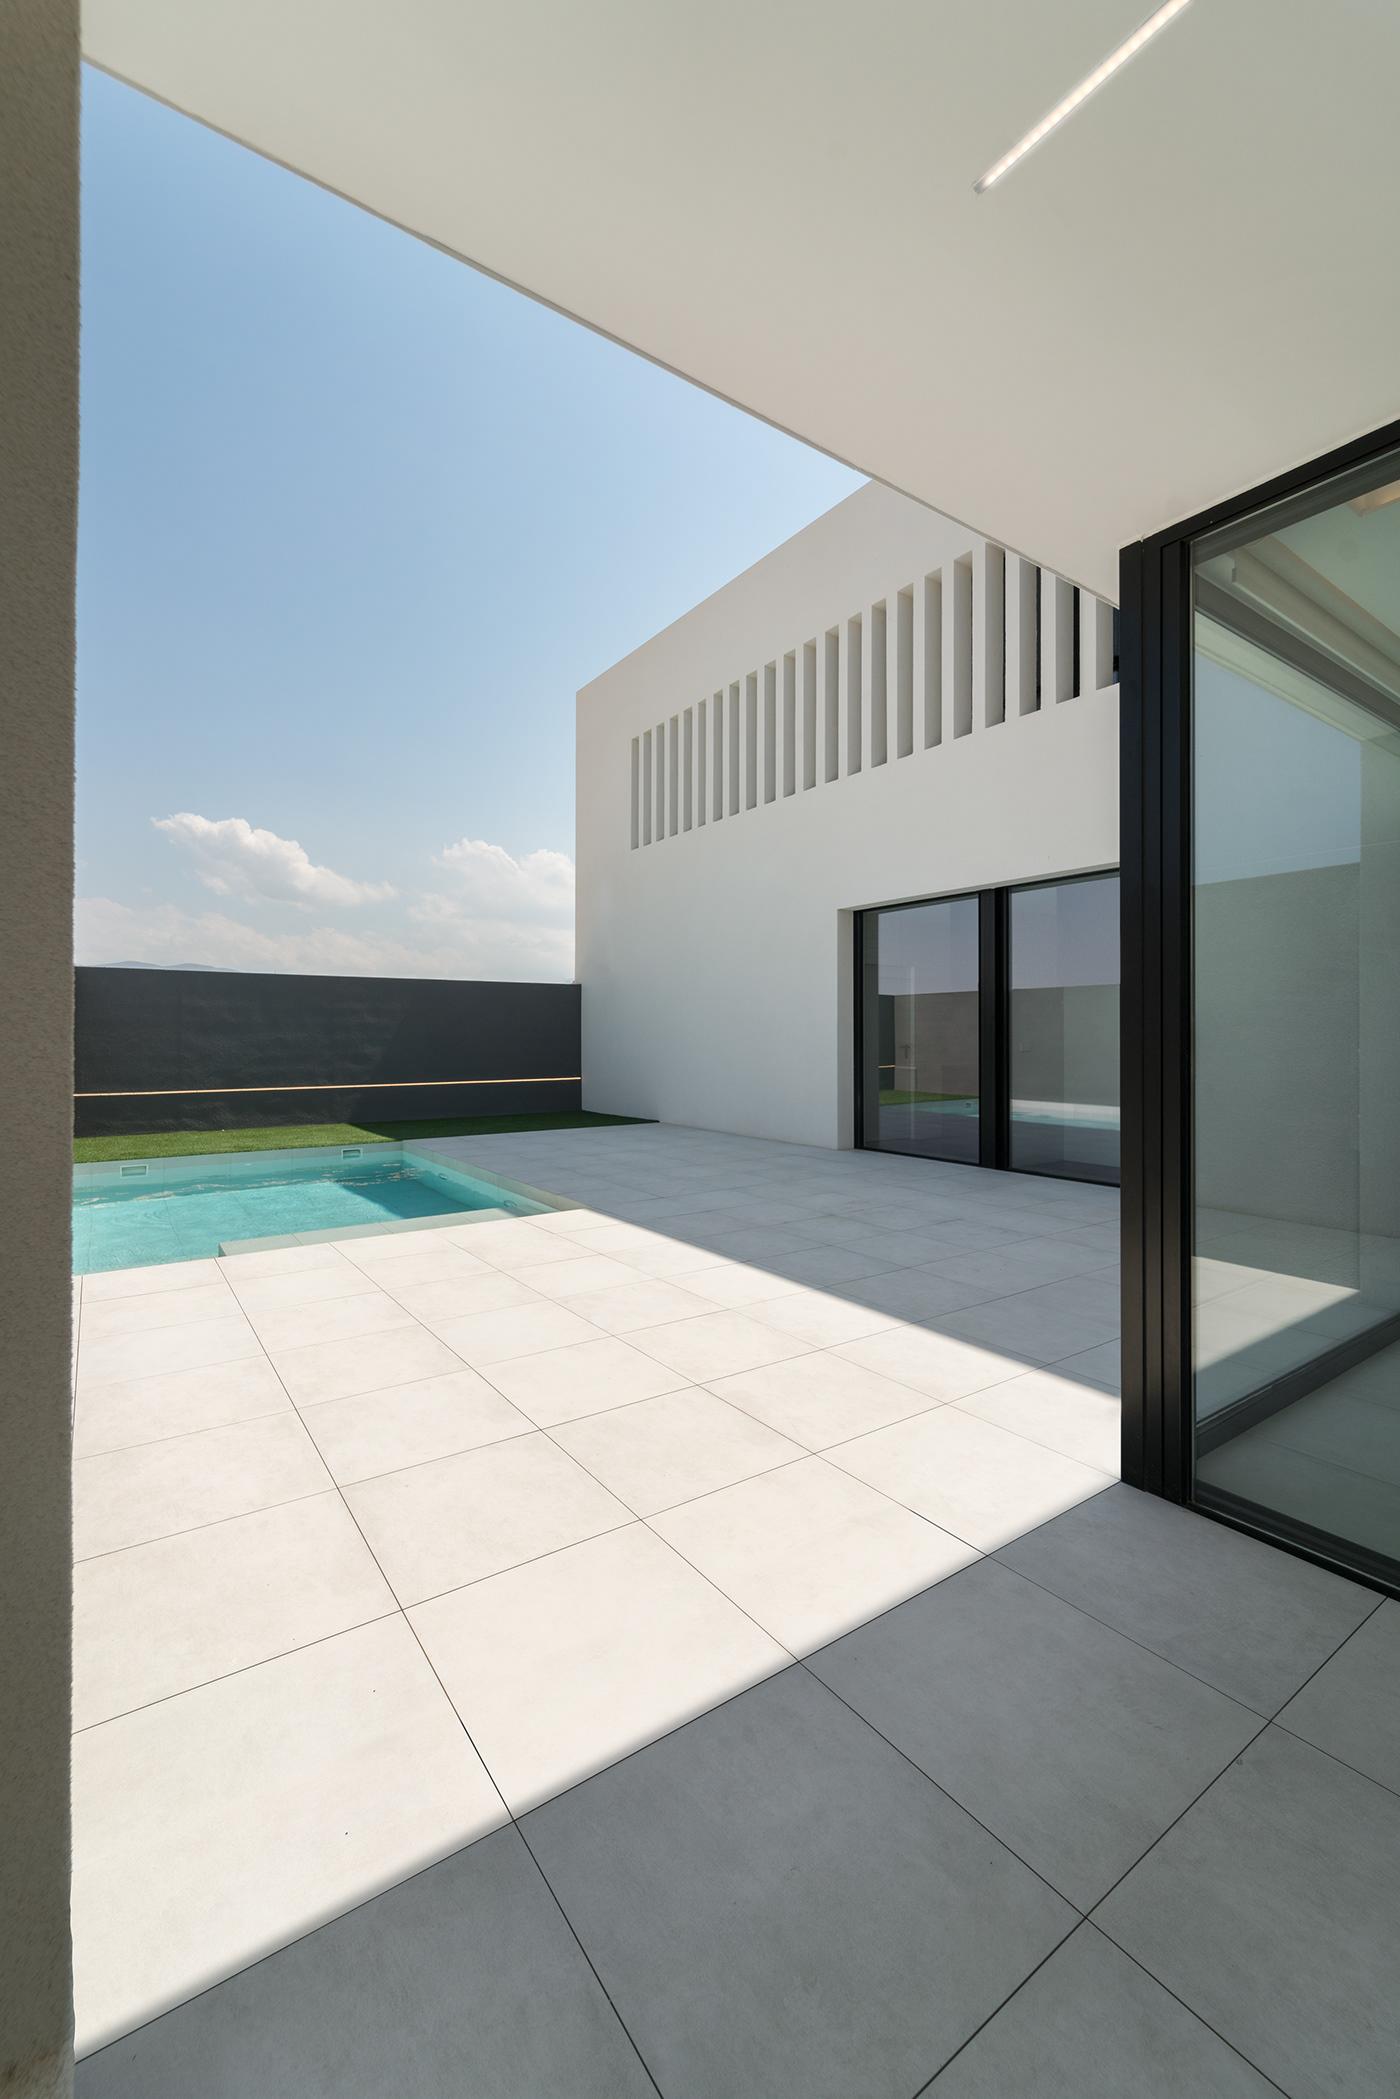 Alpha architect architecture design design interior house Photography  ruben muedra spain White House